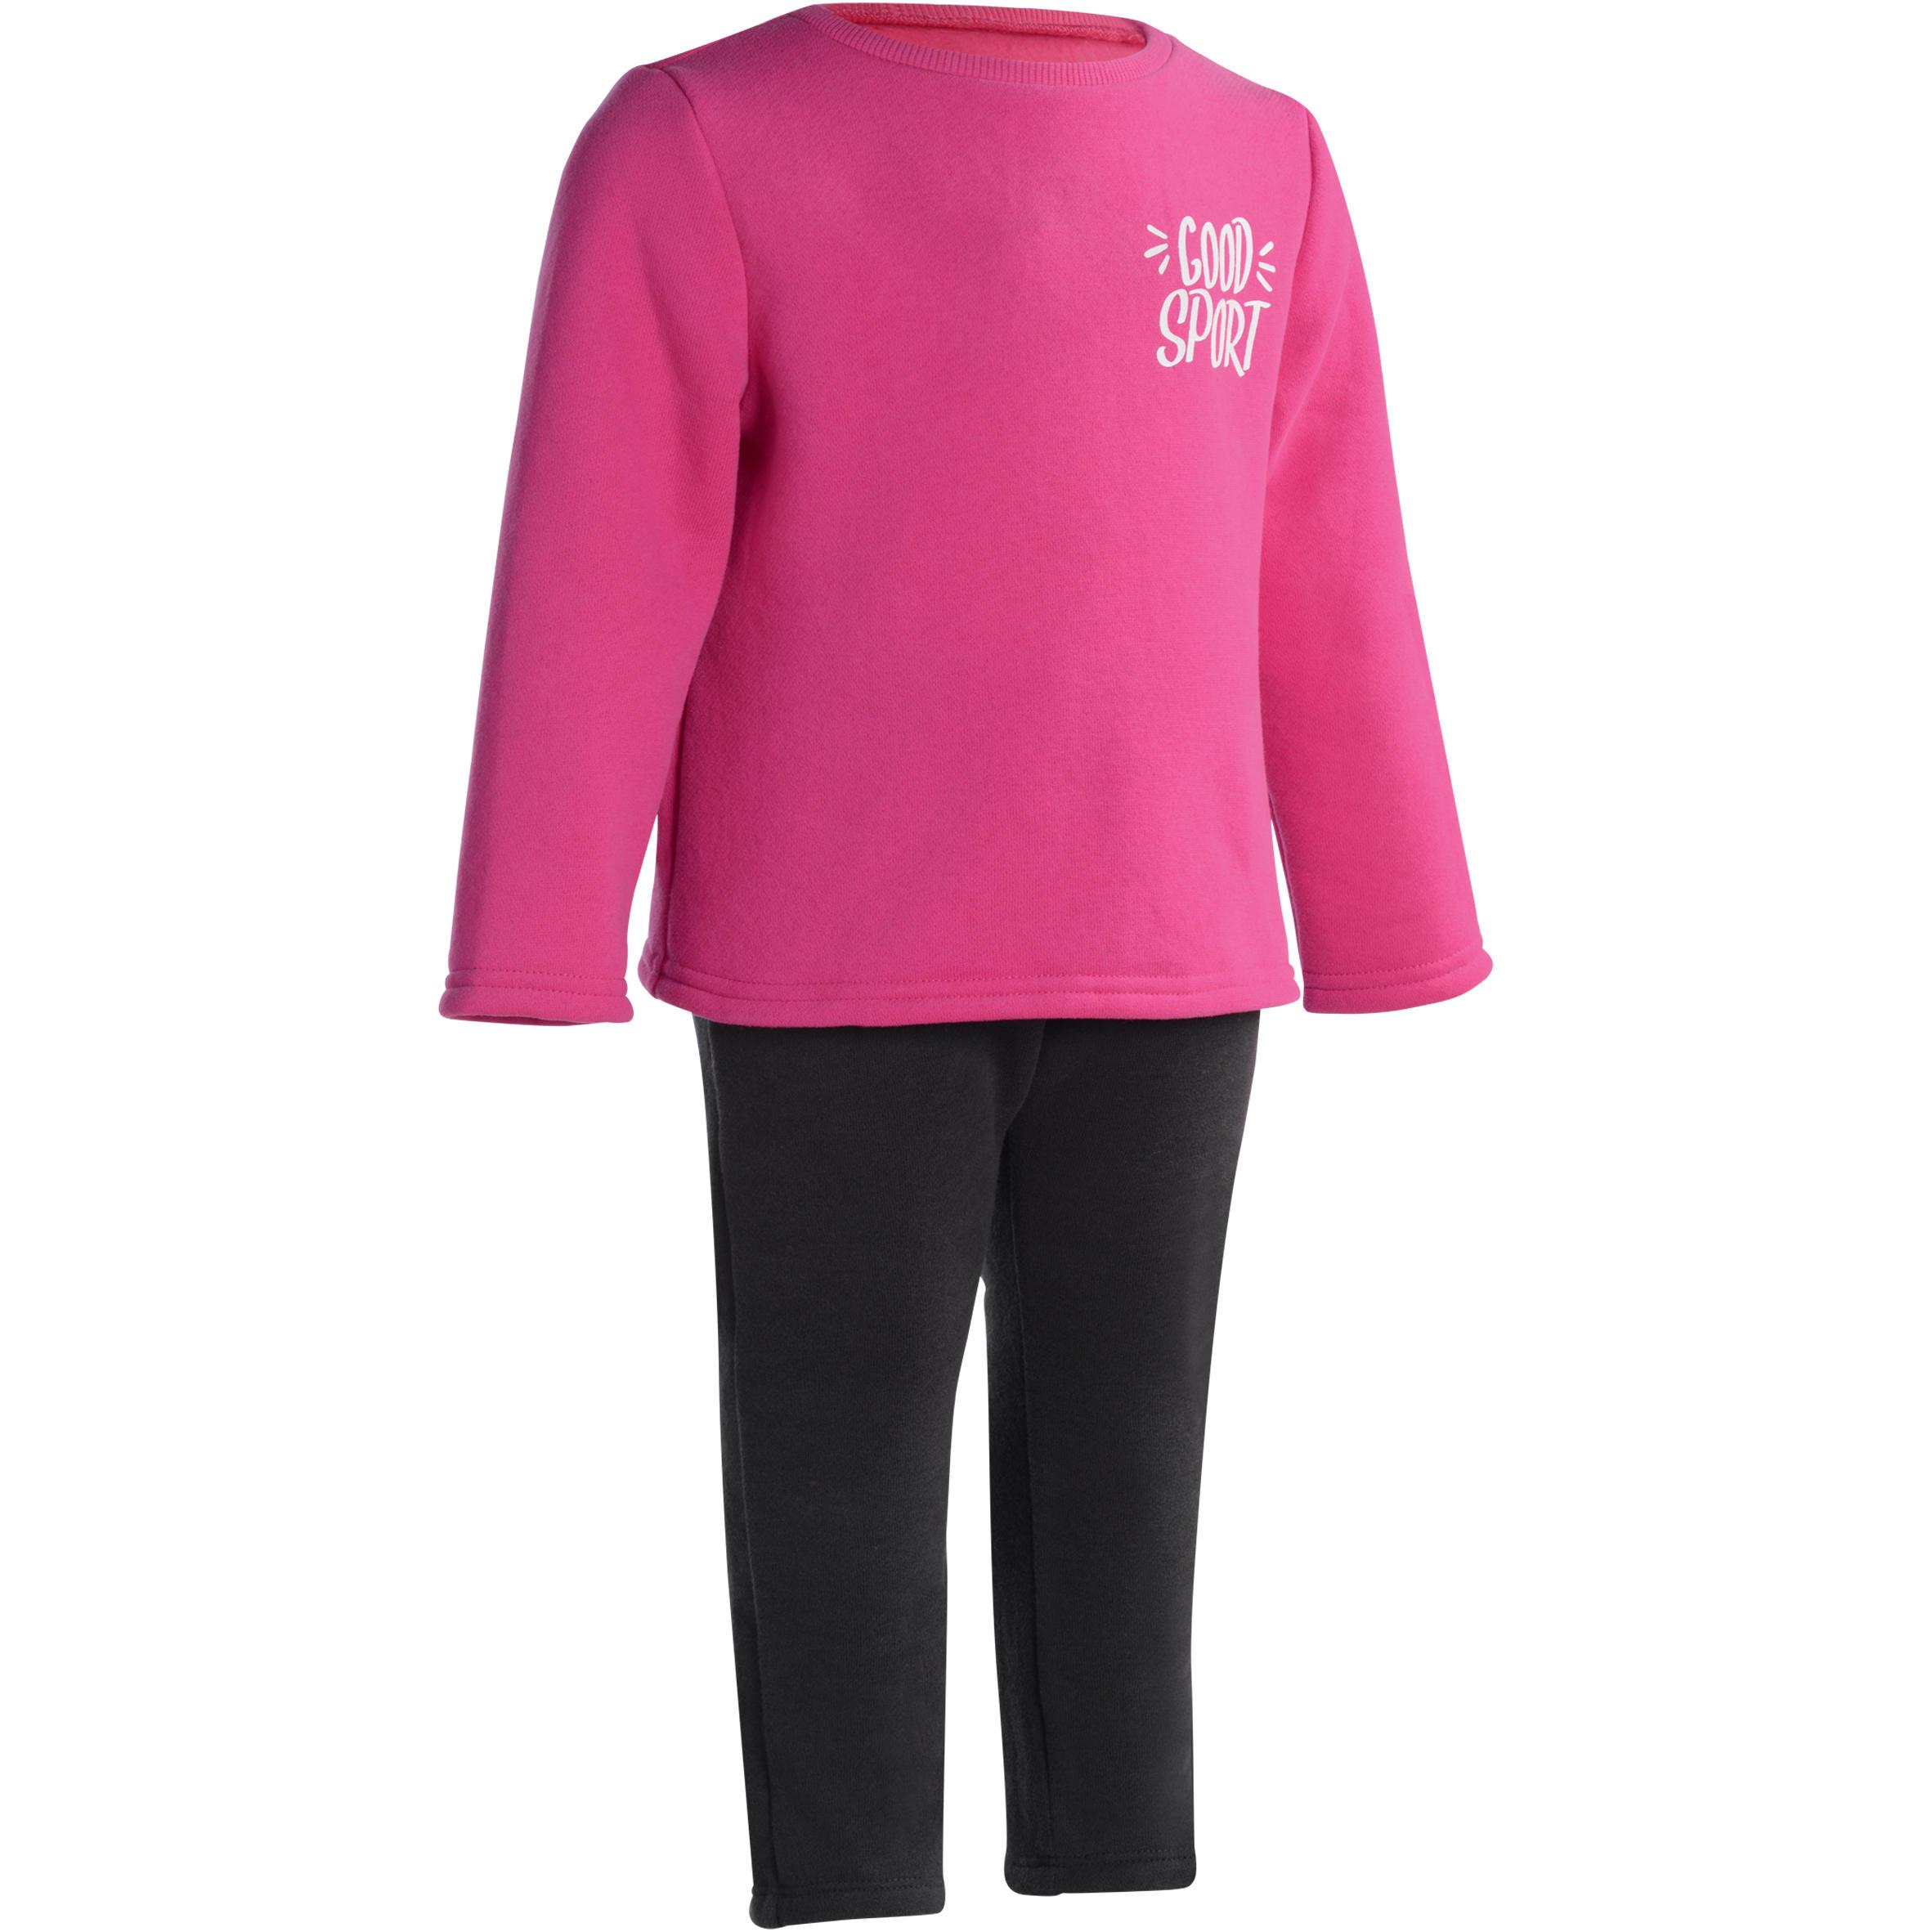 Warm'y Baby Warm Gym Tracksuit - Pink Print